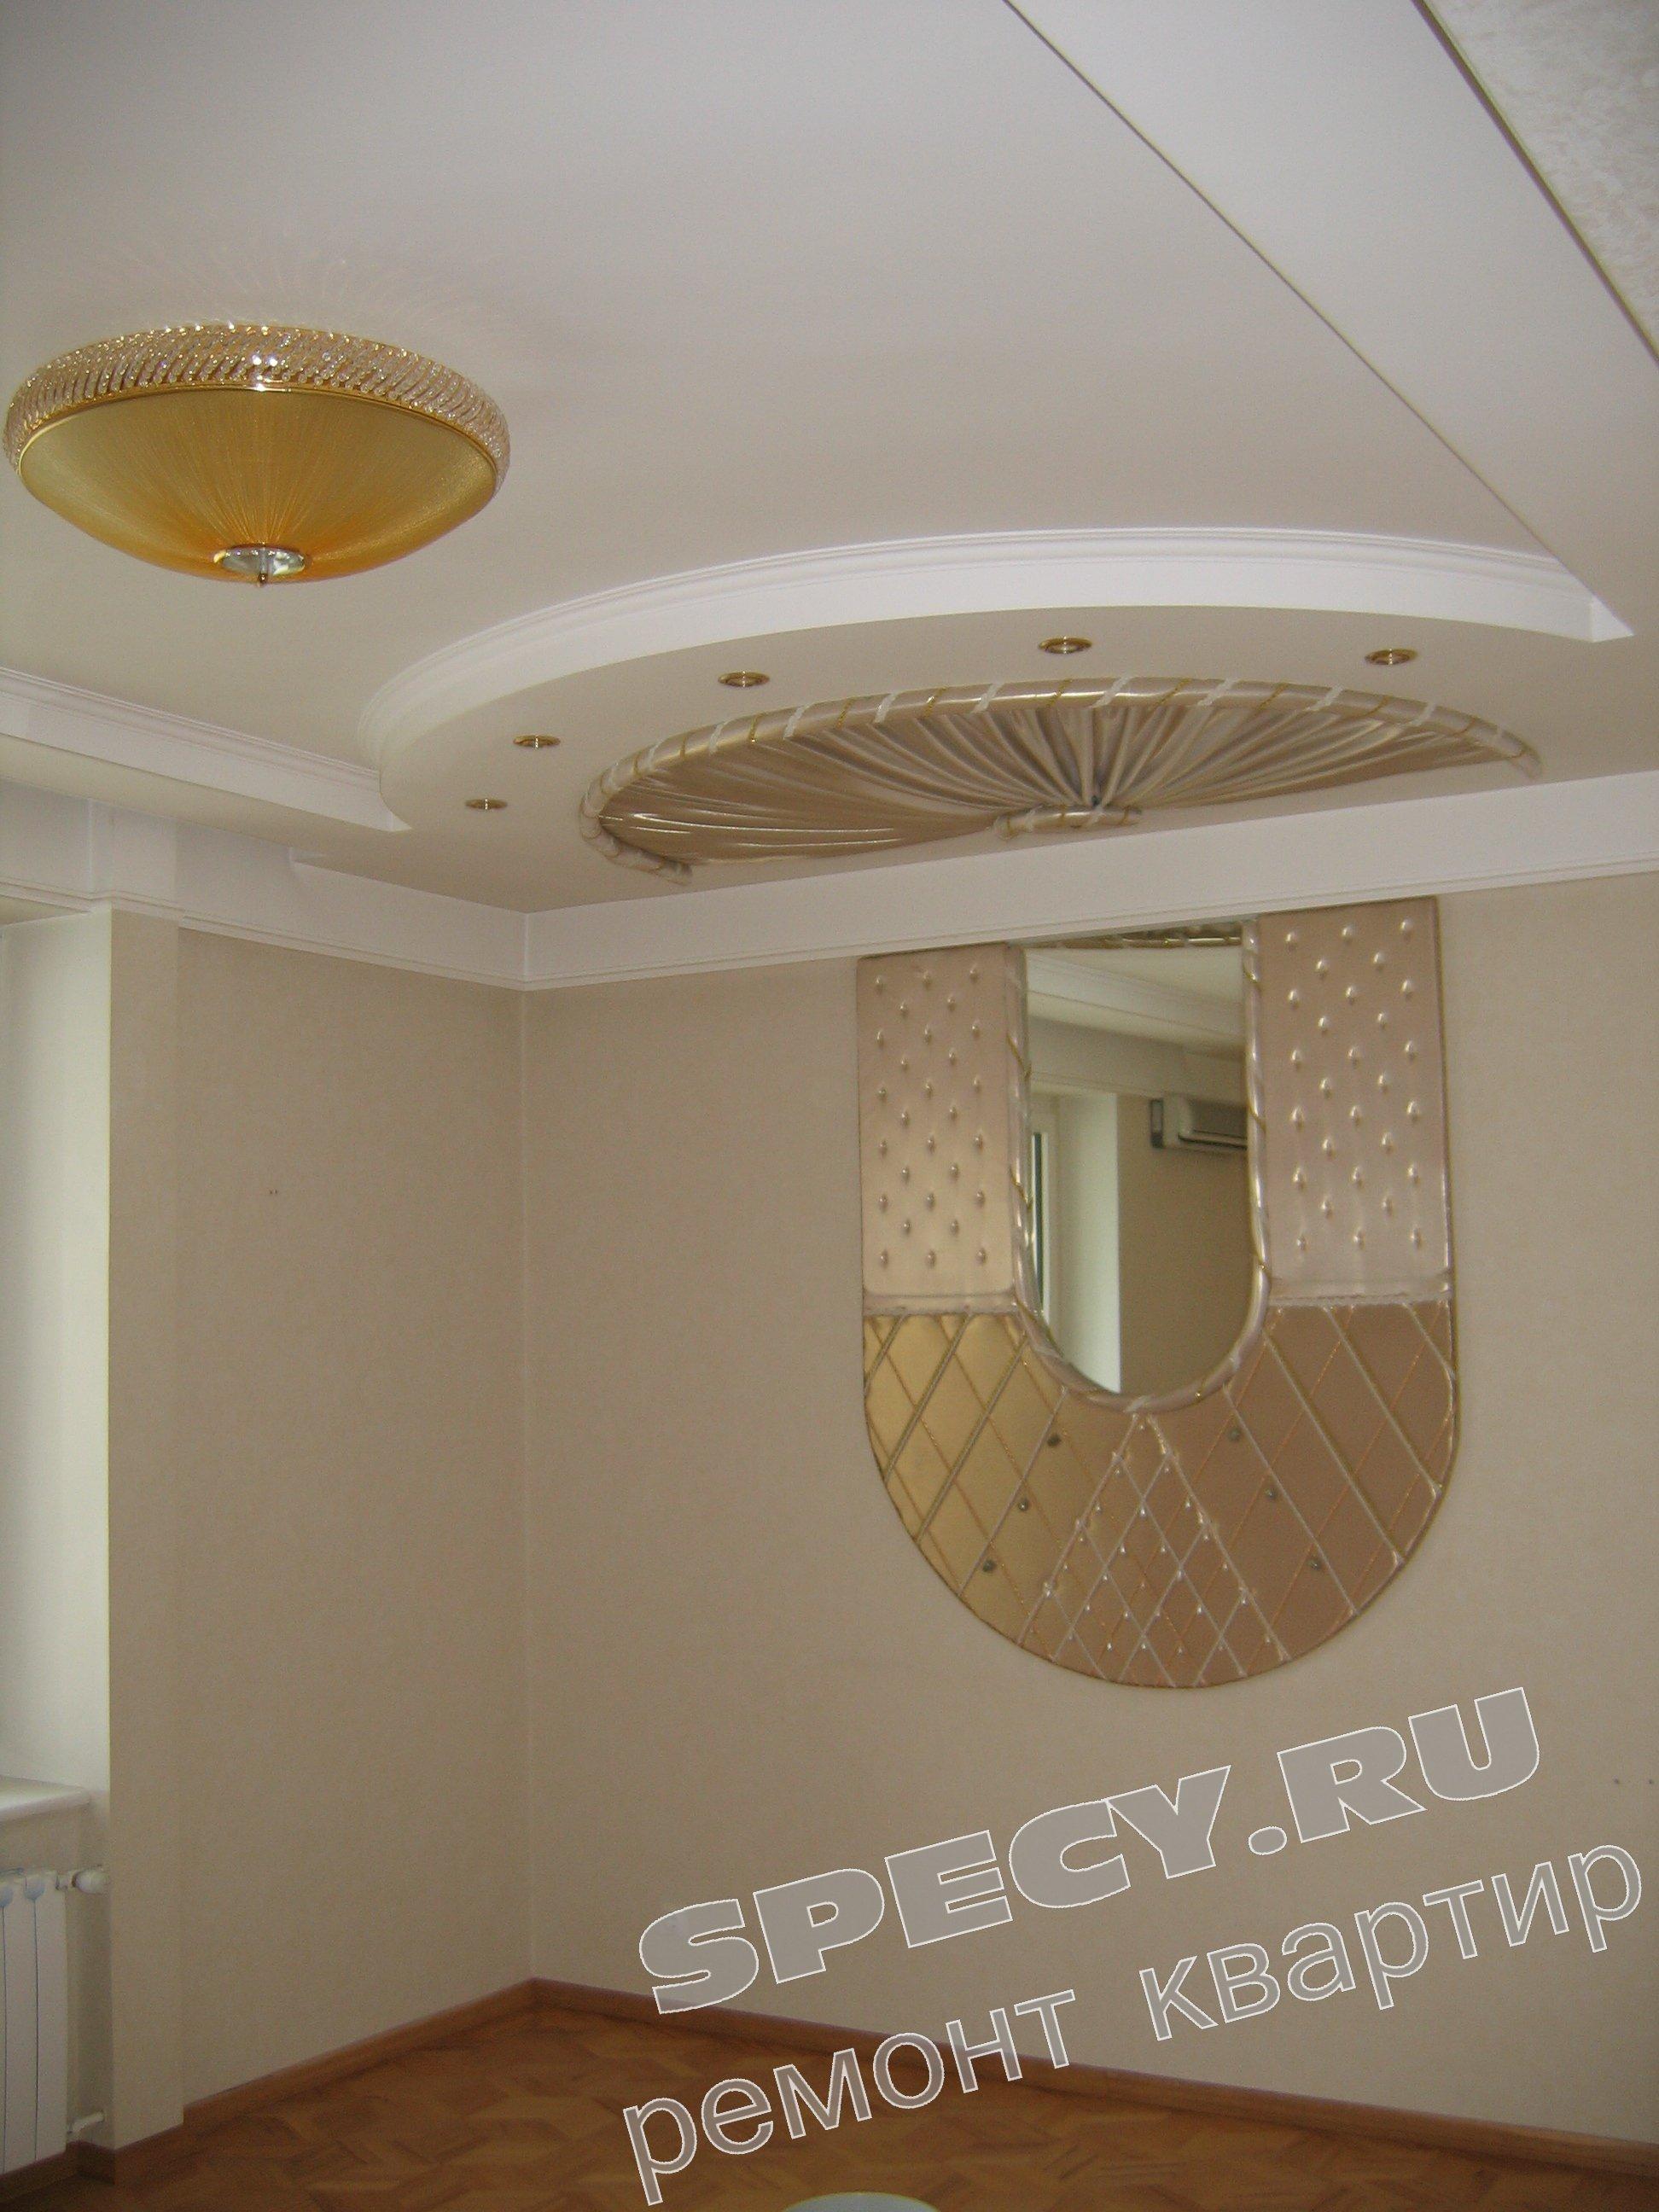 renover un plafond comment renover un plafond 6 lambris. Black Bedroom Furniture Sets. Home Design Ideas